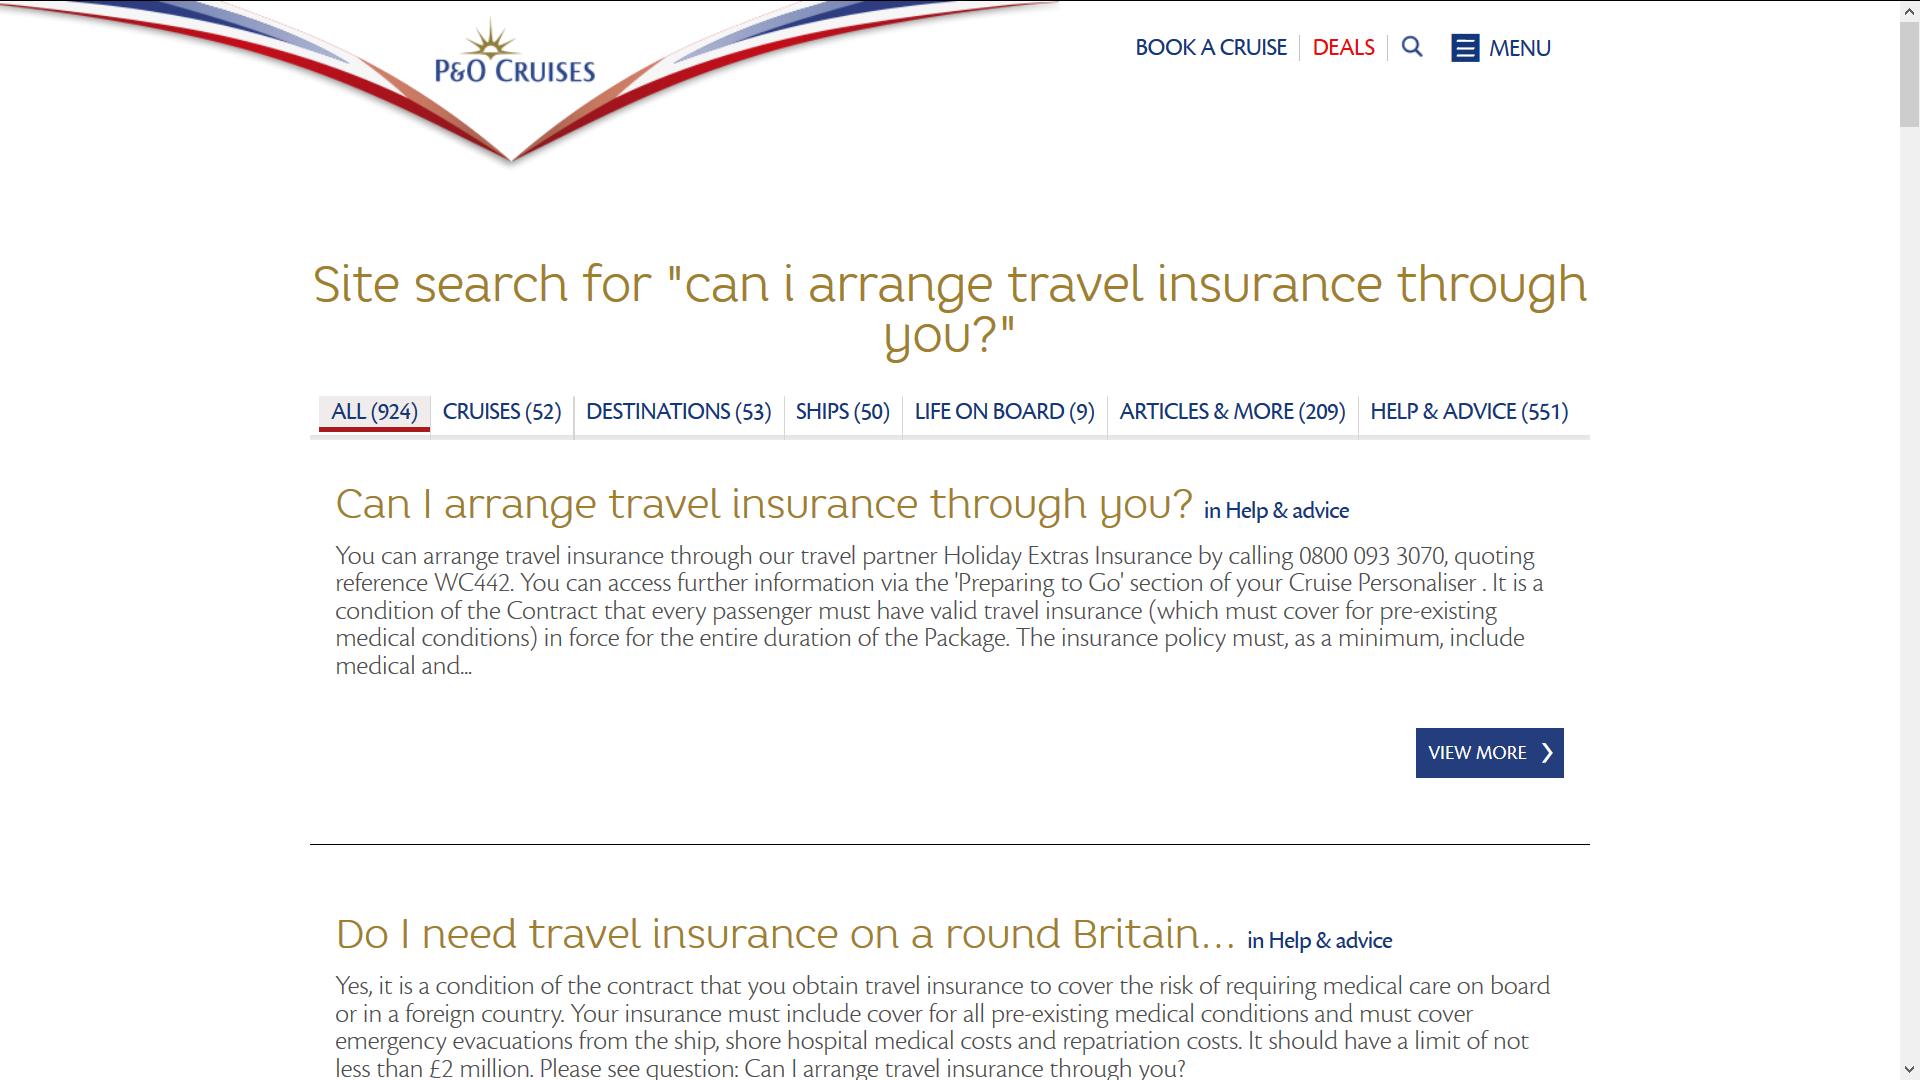 image-6-PO Cruises-–-Travel-Insurance-Partner | AardvarkCompare.com